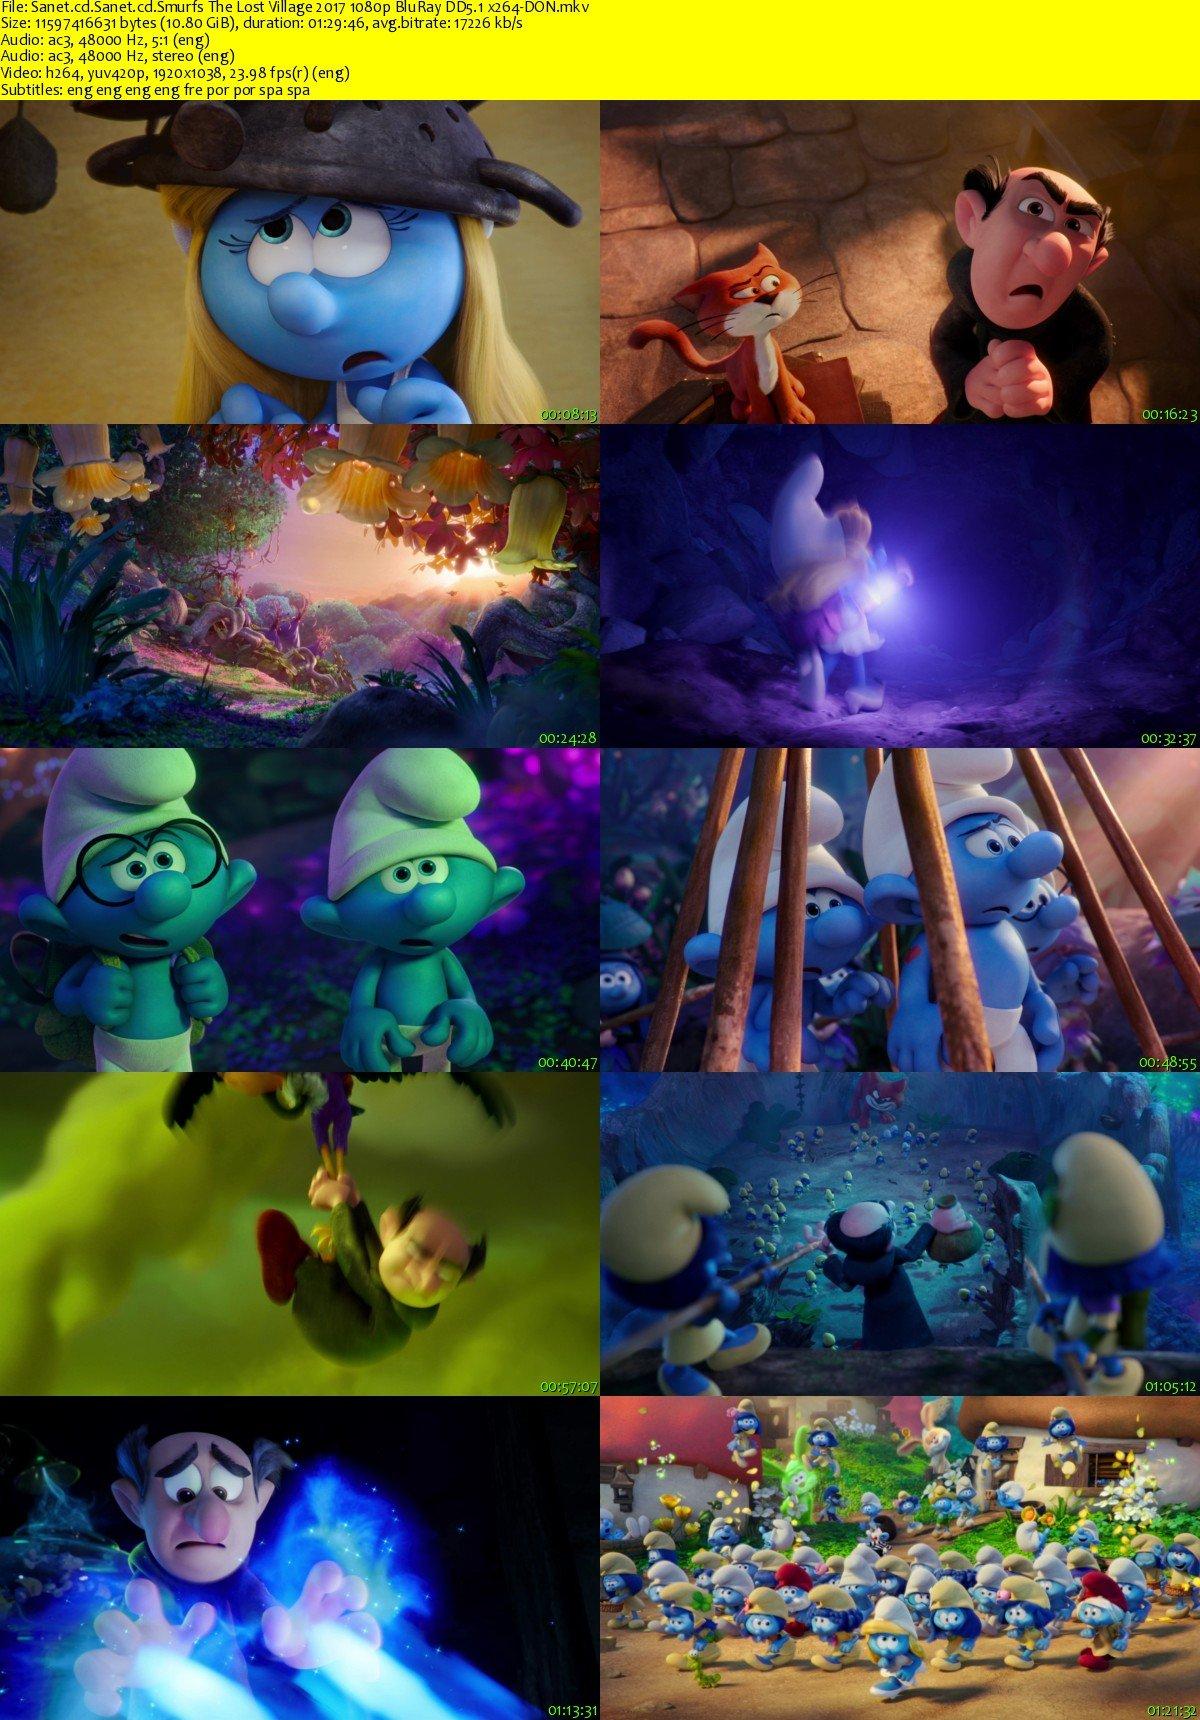 The smurfs 2018 720p bluray qebs5 aac20 mp4 fasm